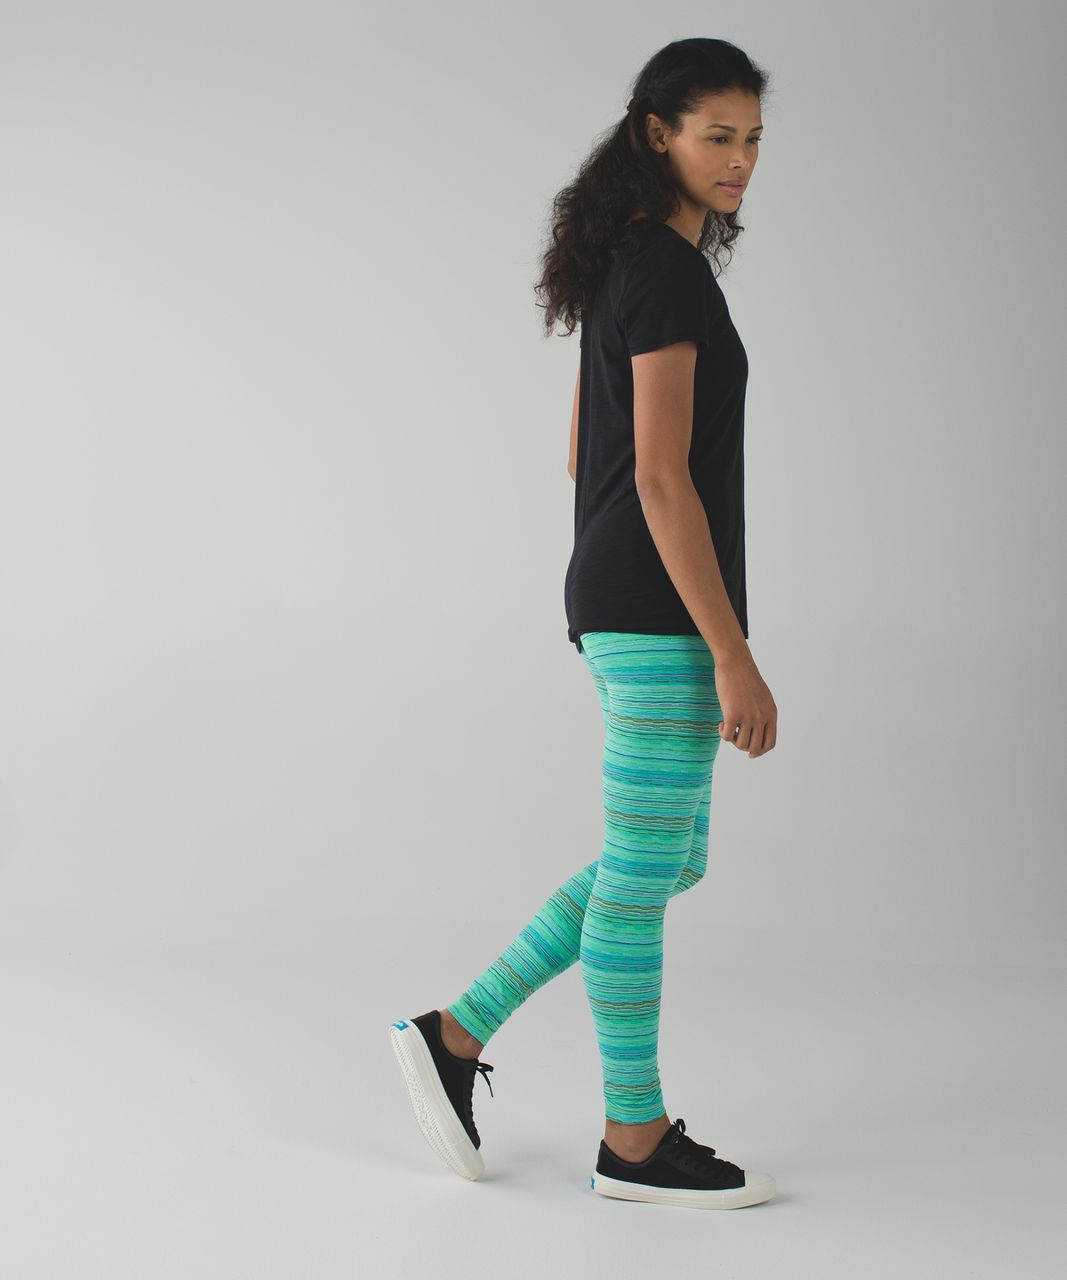 Lululemon Wunder Under Pant III - Space Dye Twist 6 Colour Dragonfly Naval Blue